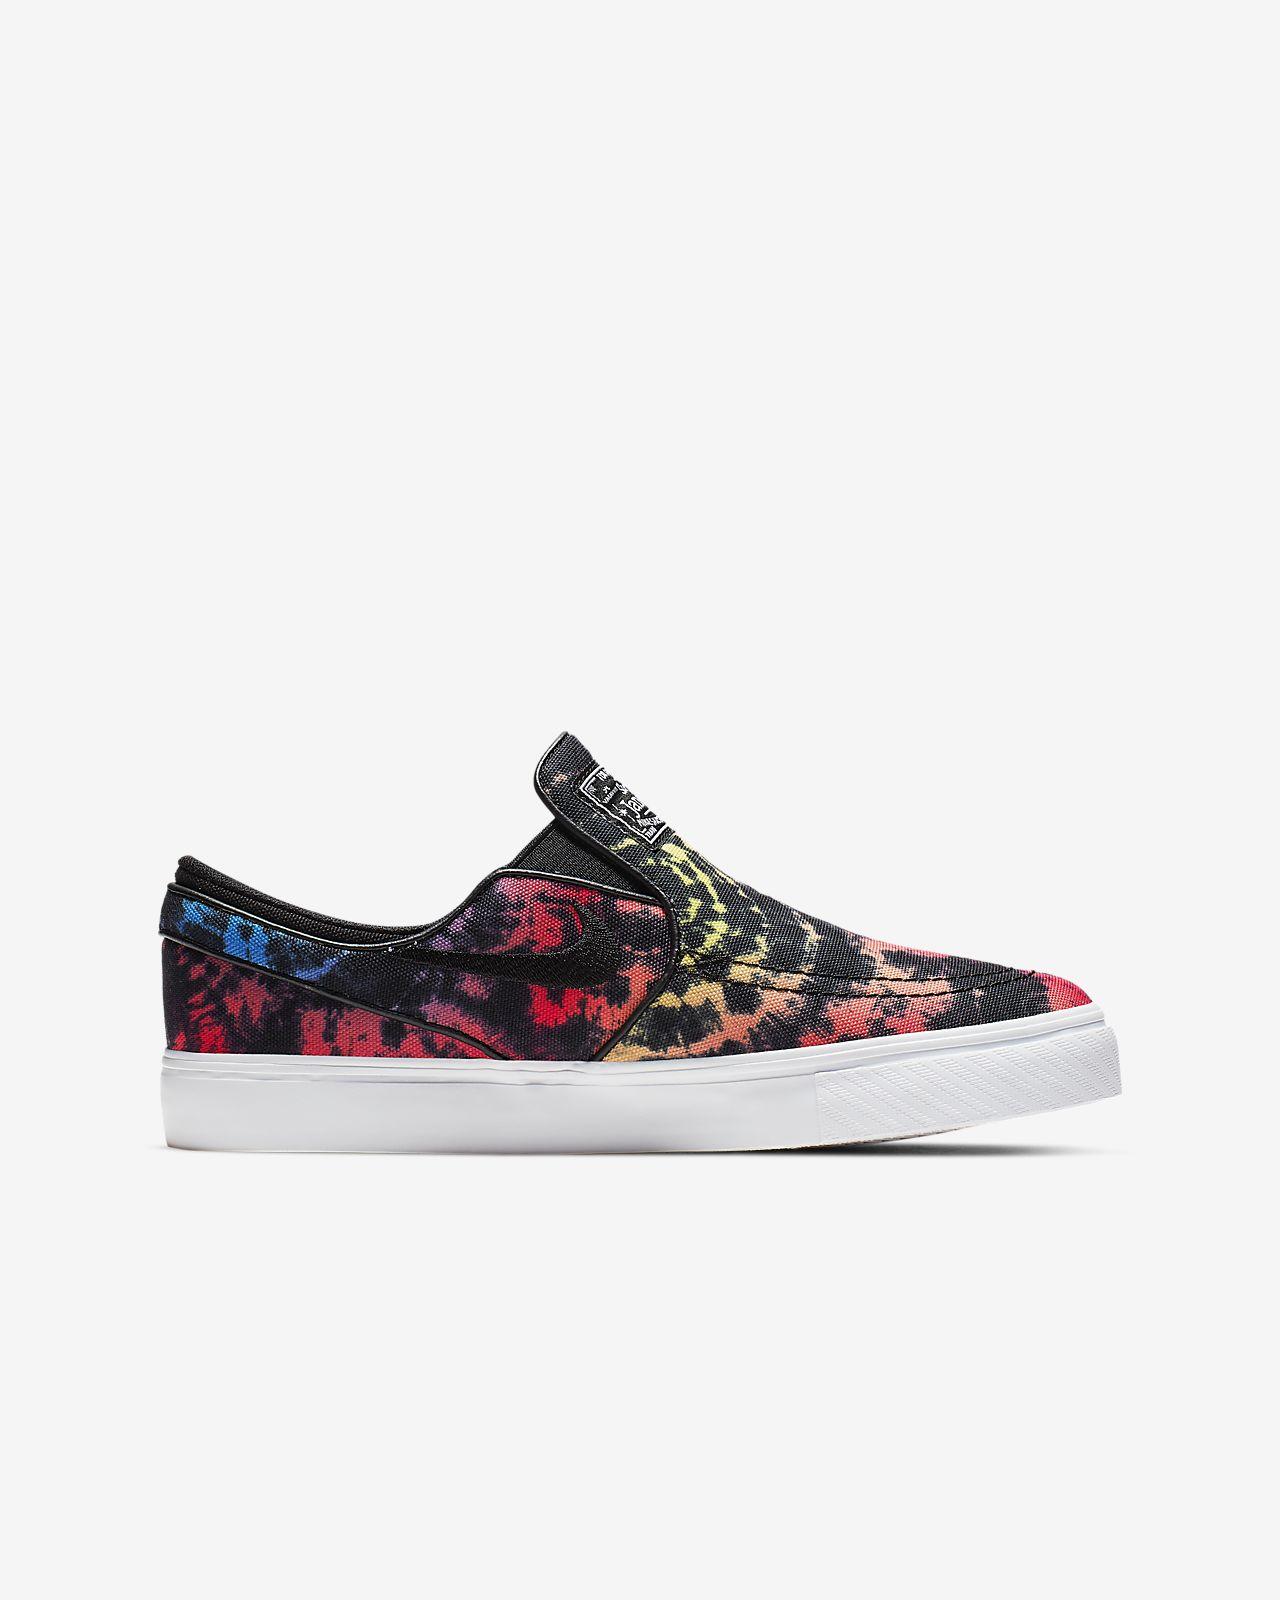 free shipping 27ec1 300a5 ... Nike SB Stefan Janoski Canvas Slip Tie-Dye Older Kids  Skate Shoe